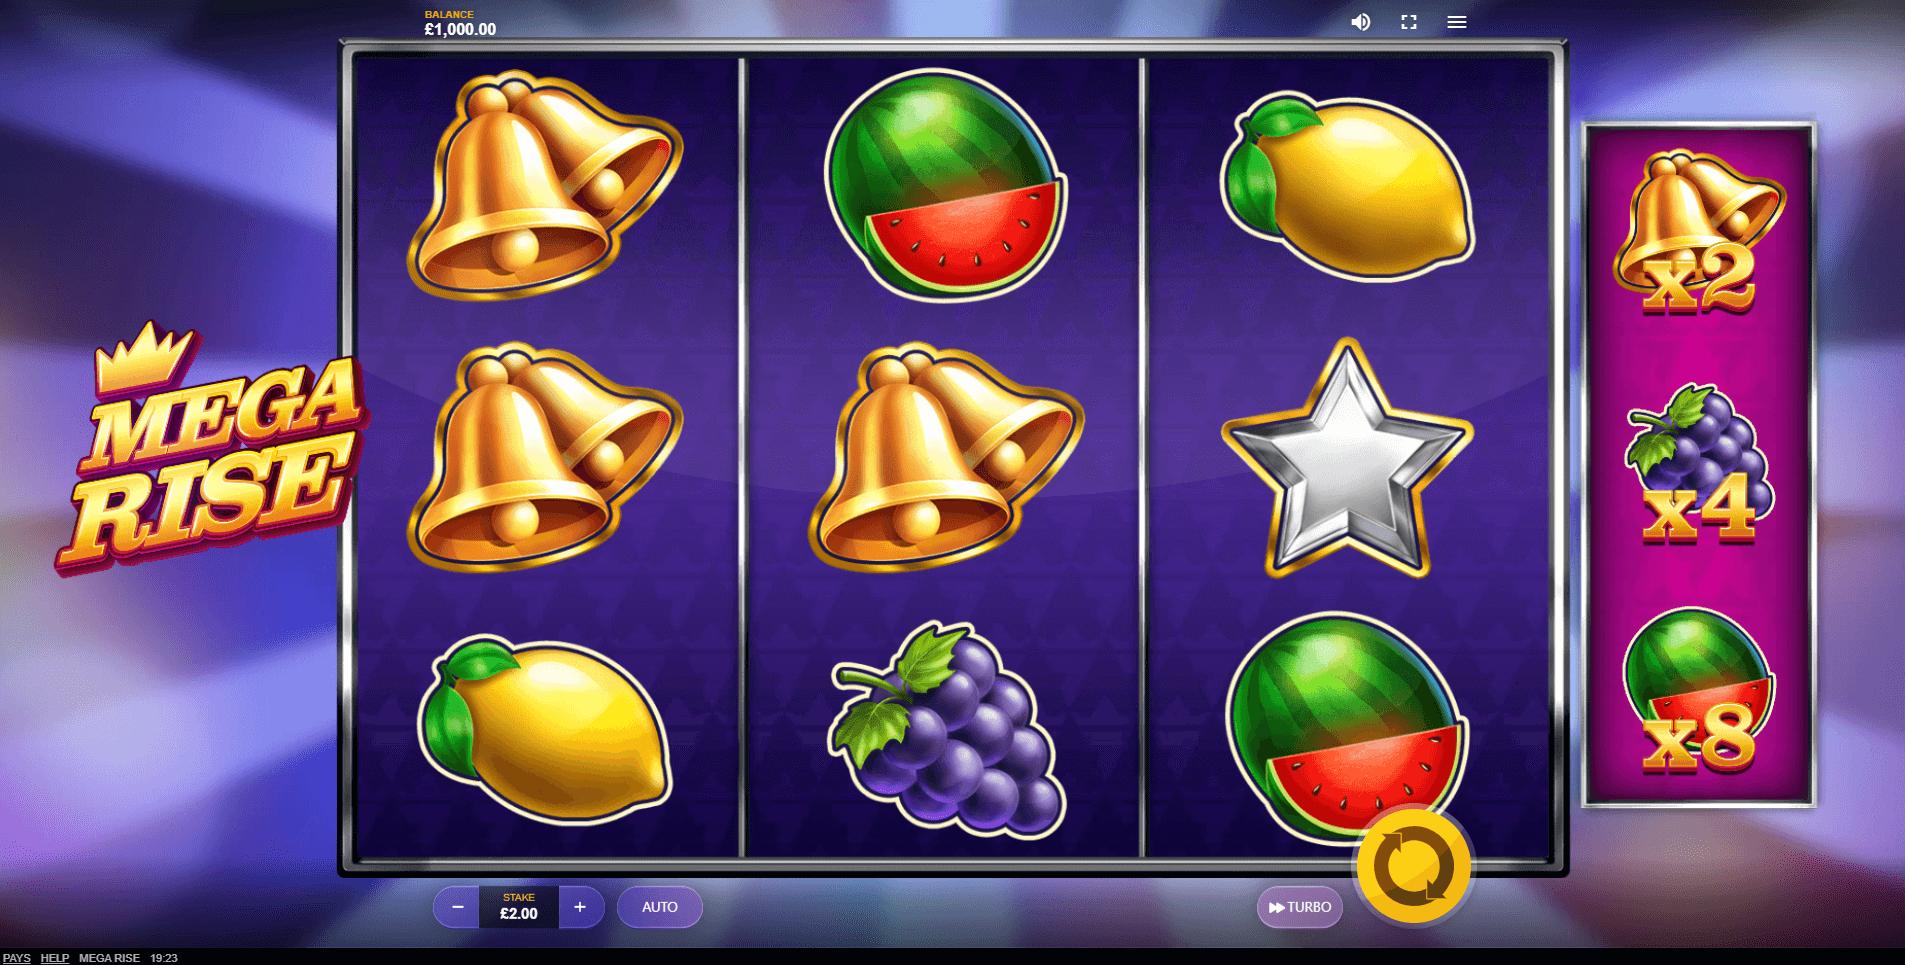 Mega Rise slot machine screenshot